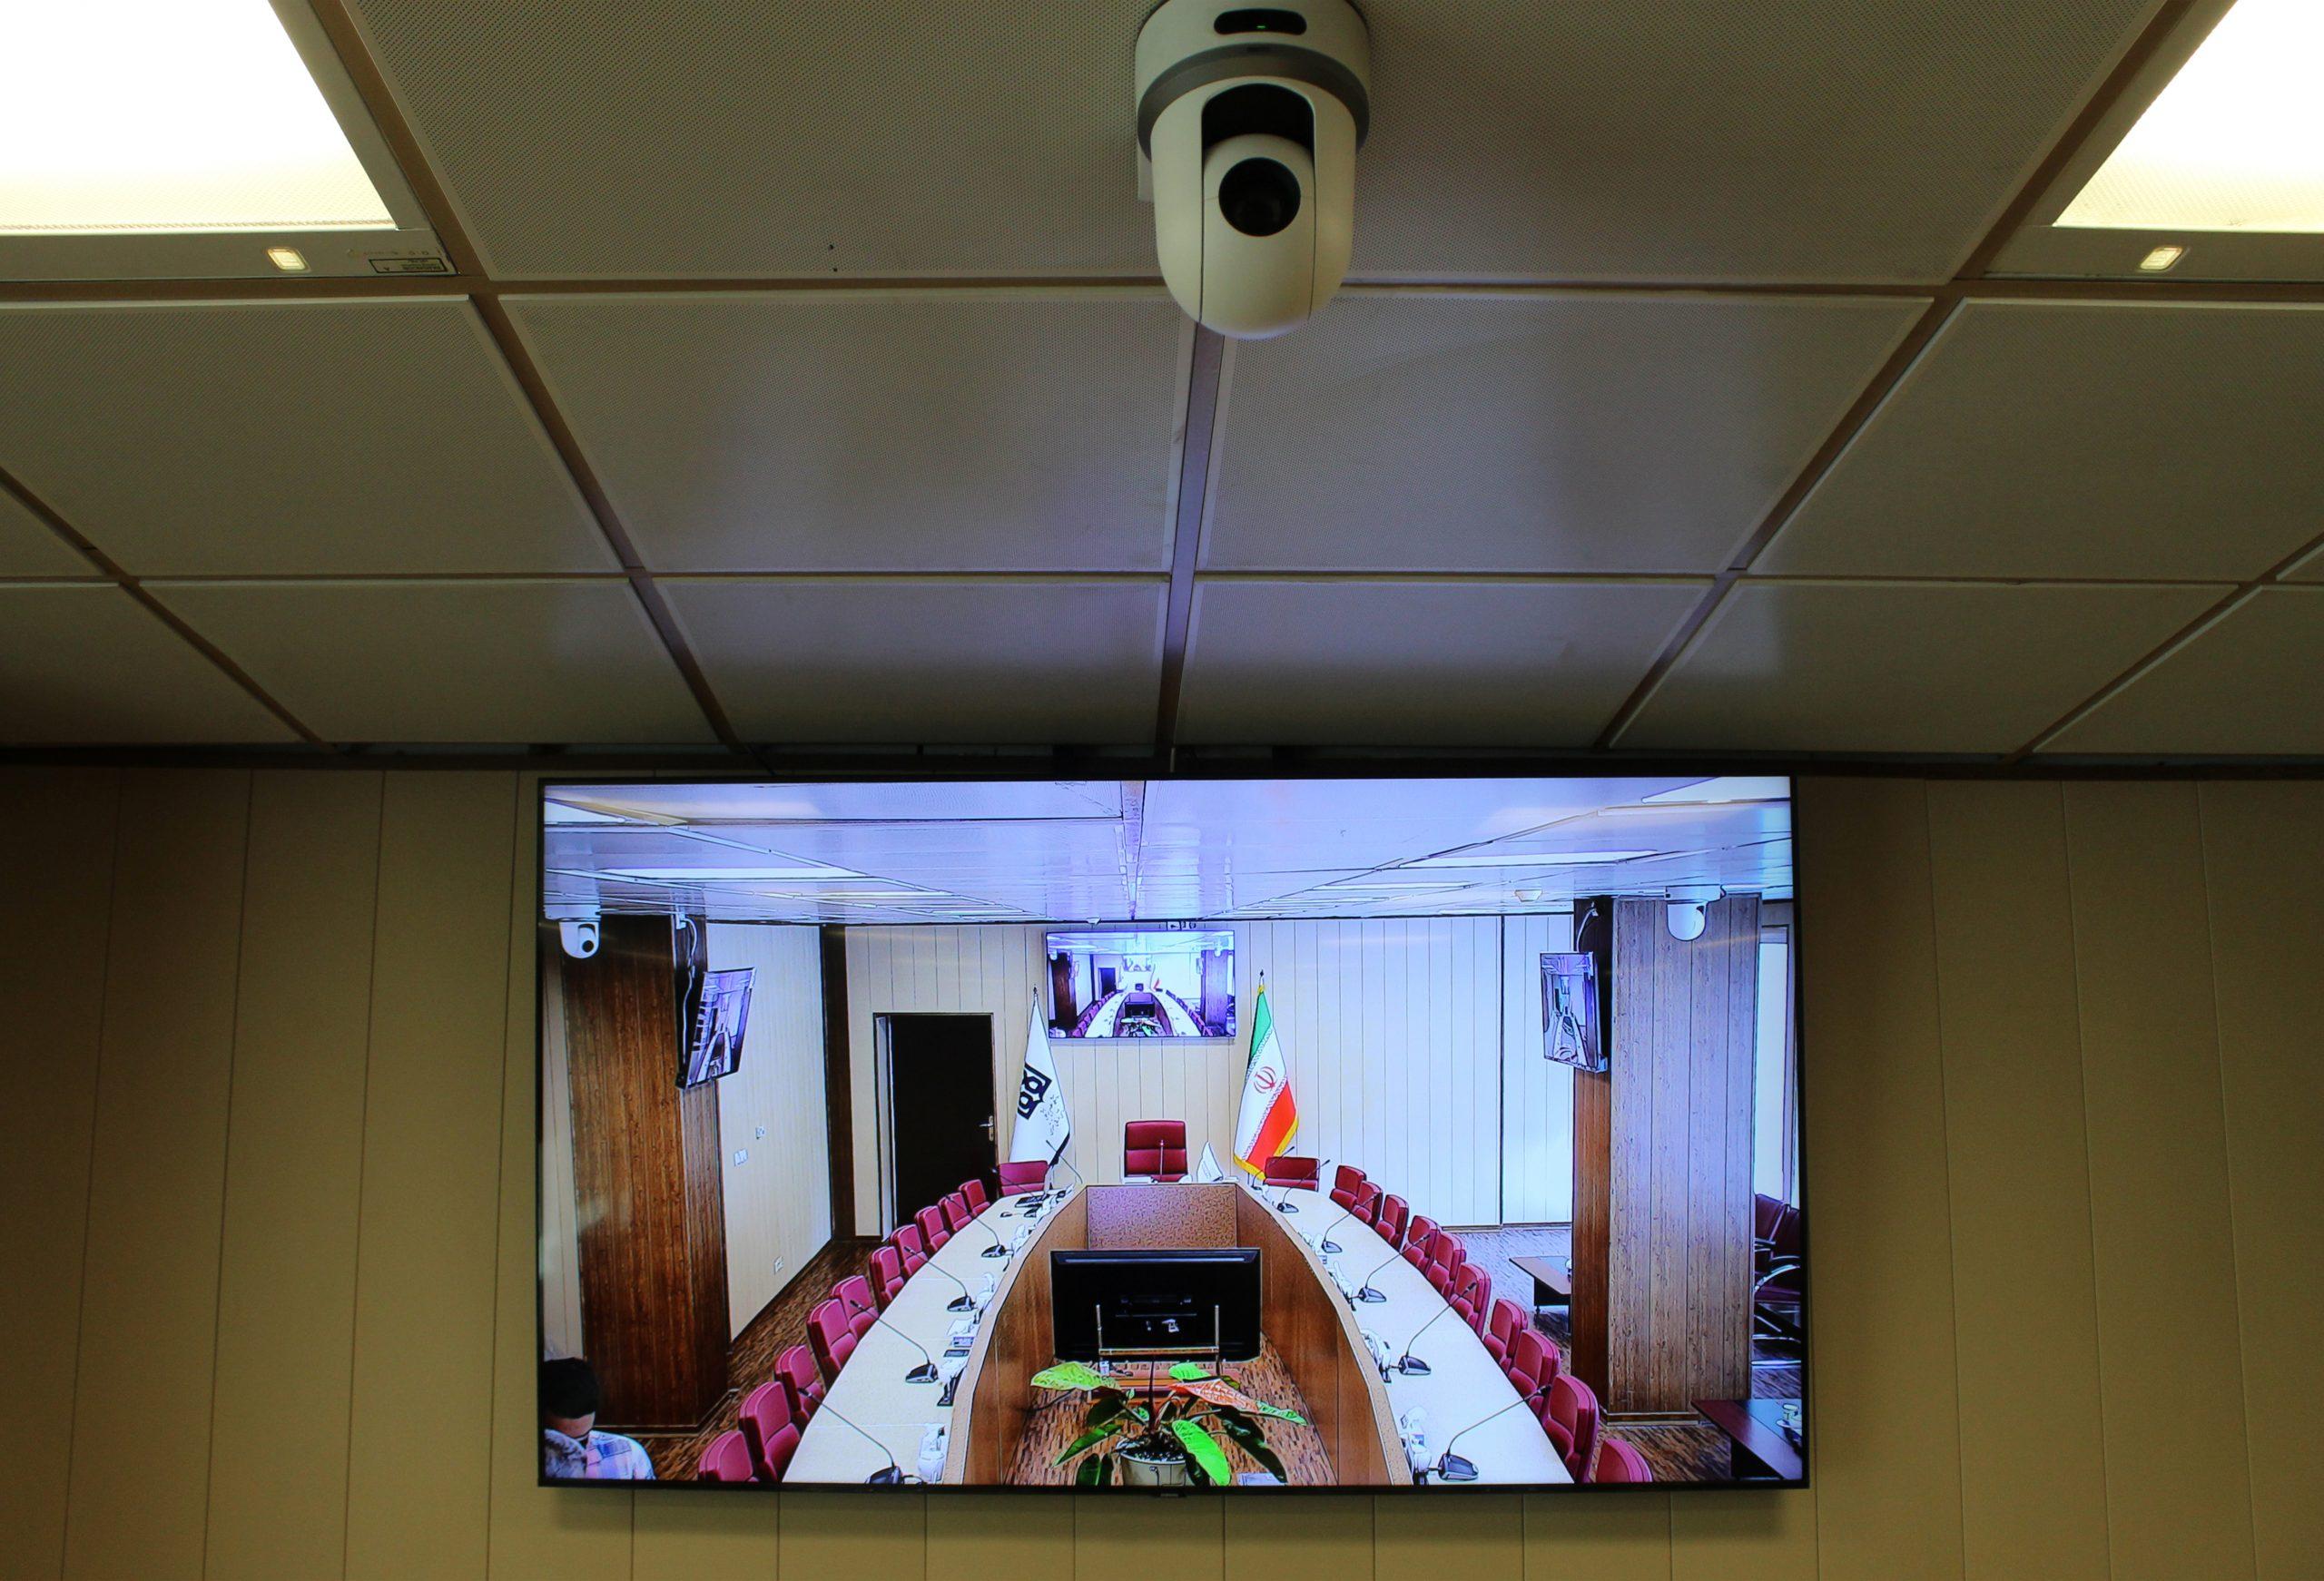 دوربین اتوترک و سیستم کنفرانس